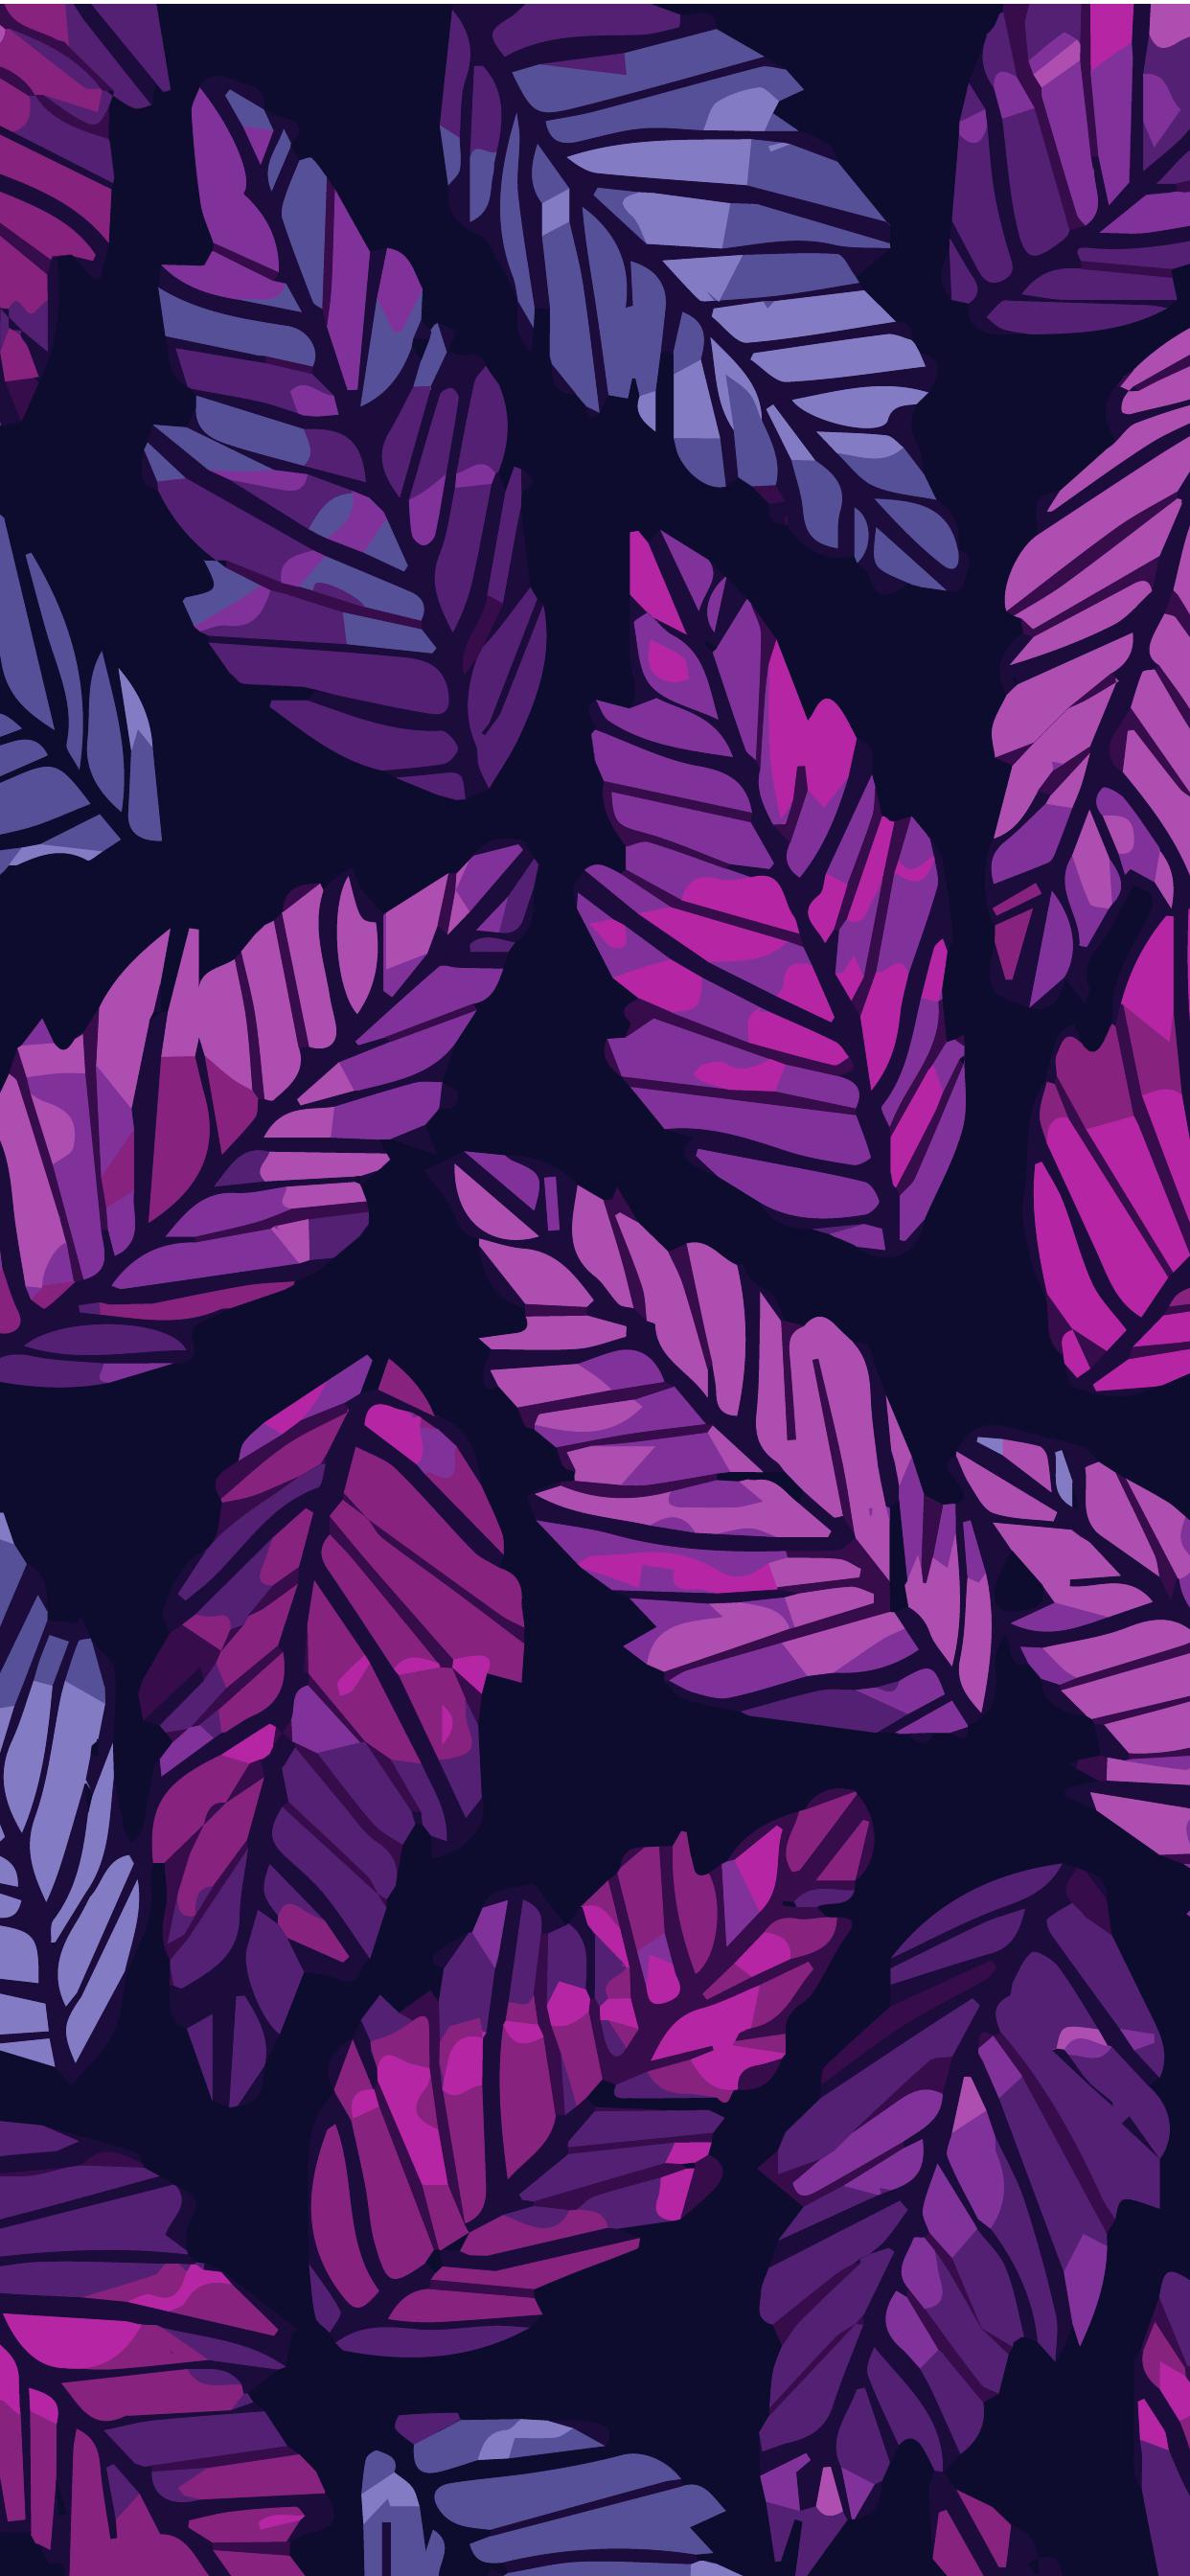 Phone Wallpaper Hd Purple Leafs Heroscreen Cool Wallpapers